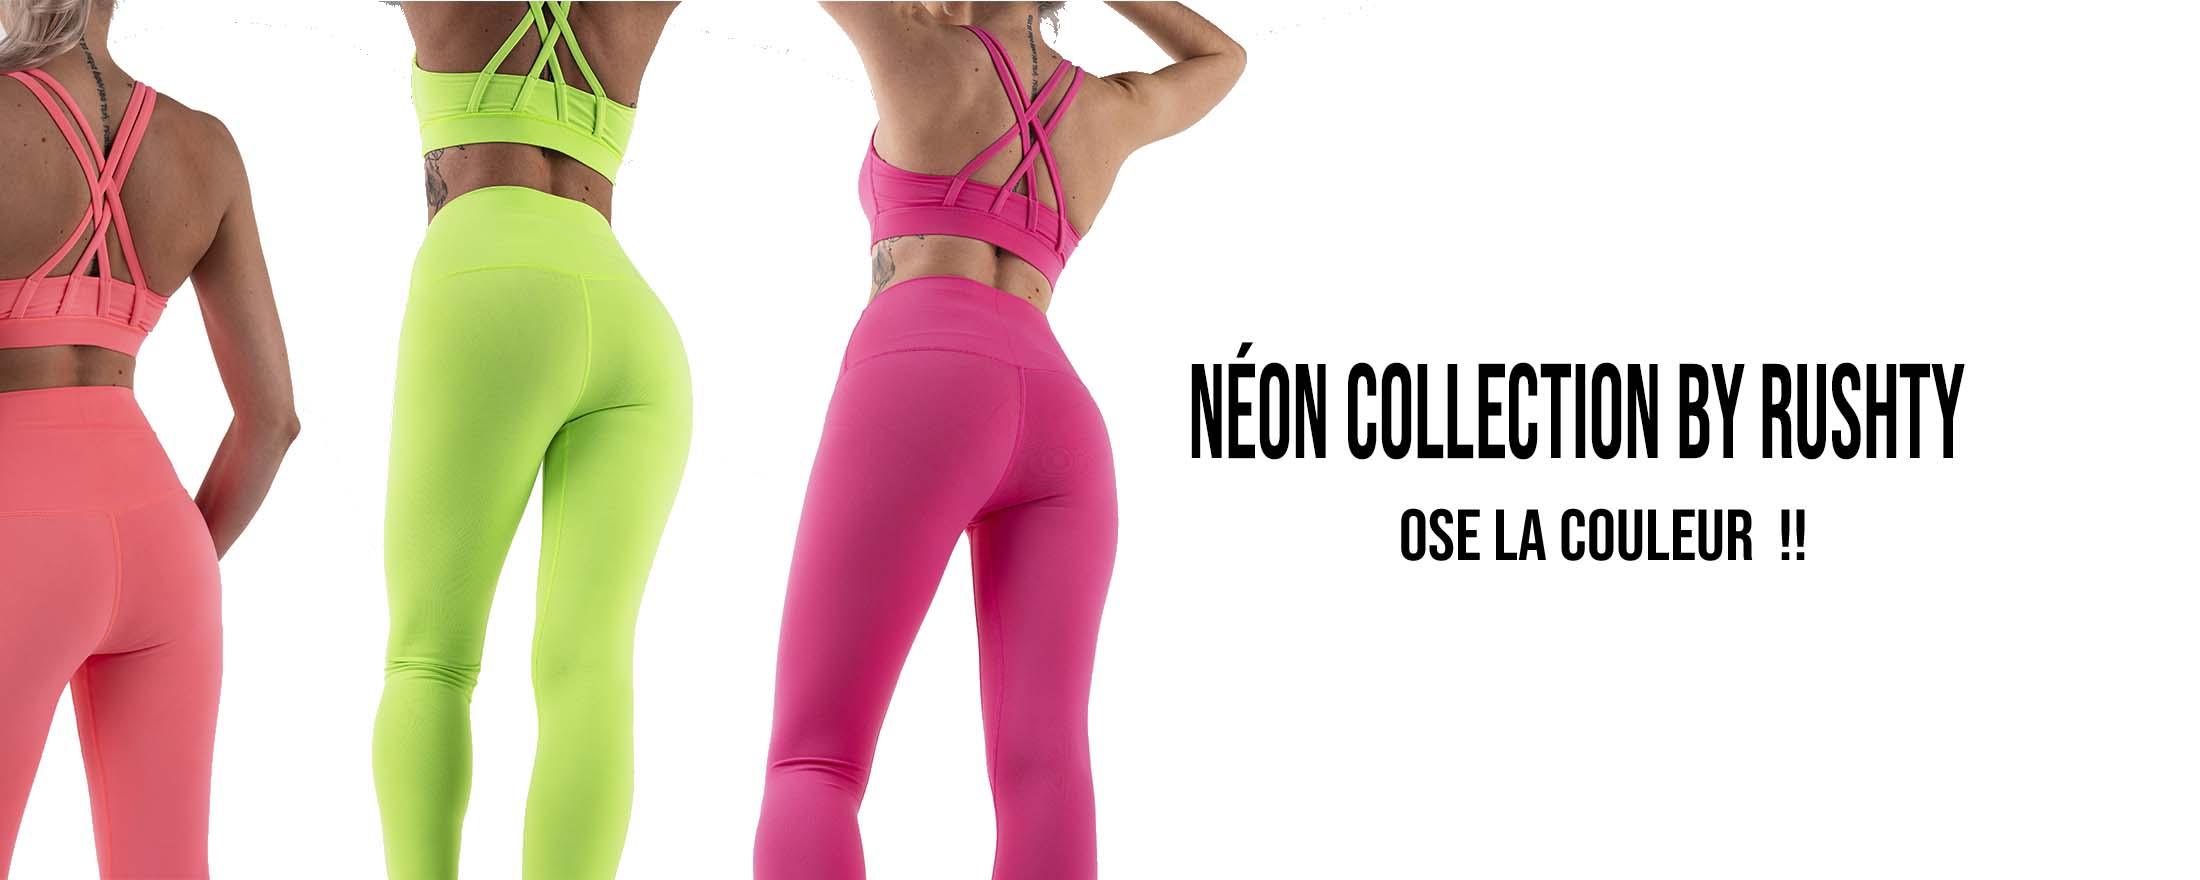 Néon collection